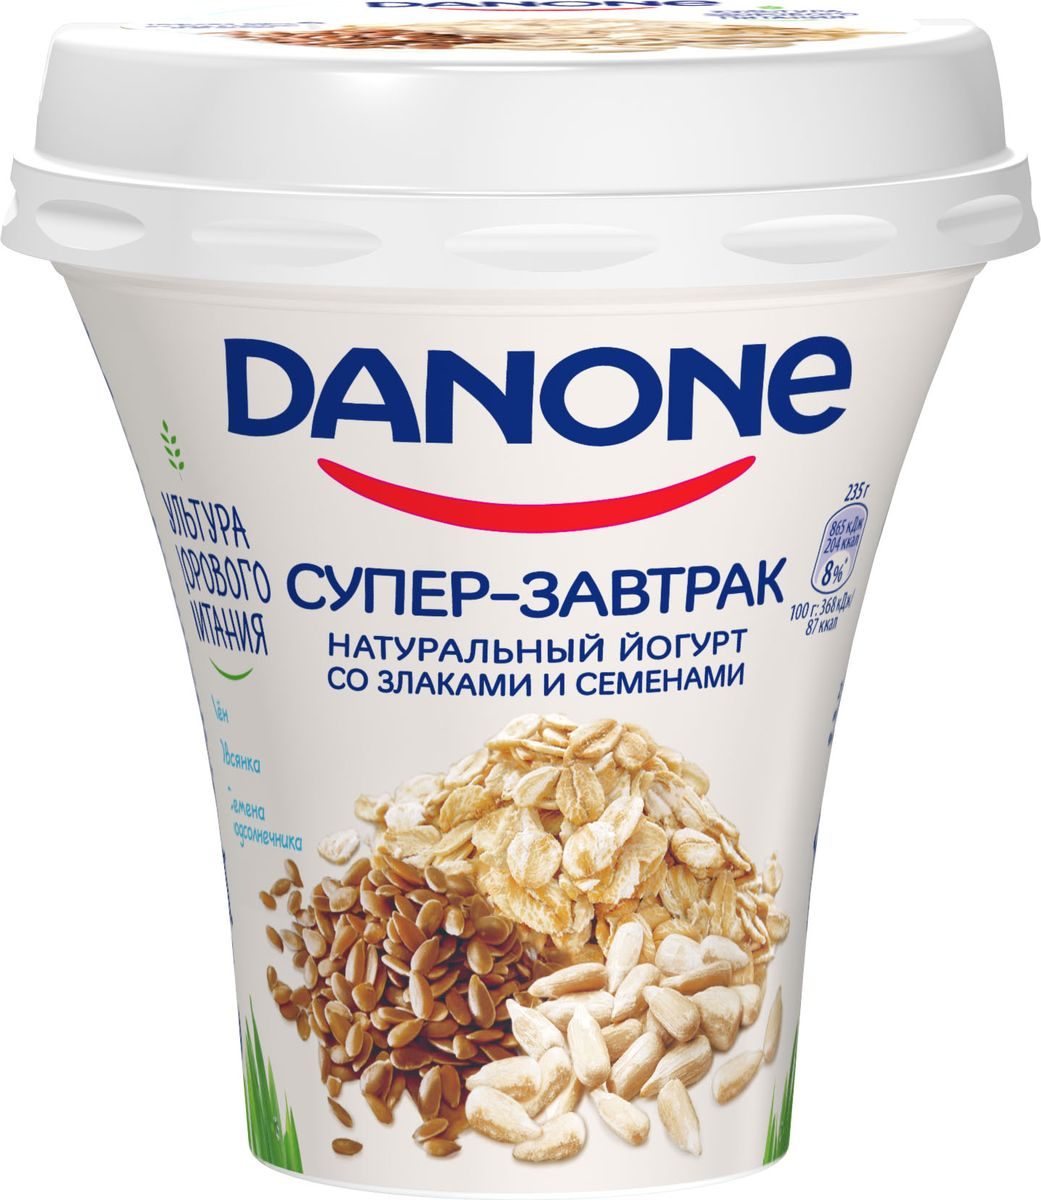 Danone Супер-завтрак Йогурт питьевой Злаки и Семена 2,6%, 235 г danone йогурт питьевой 2 5